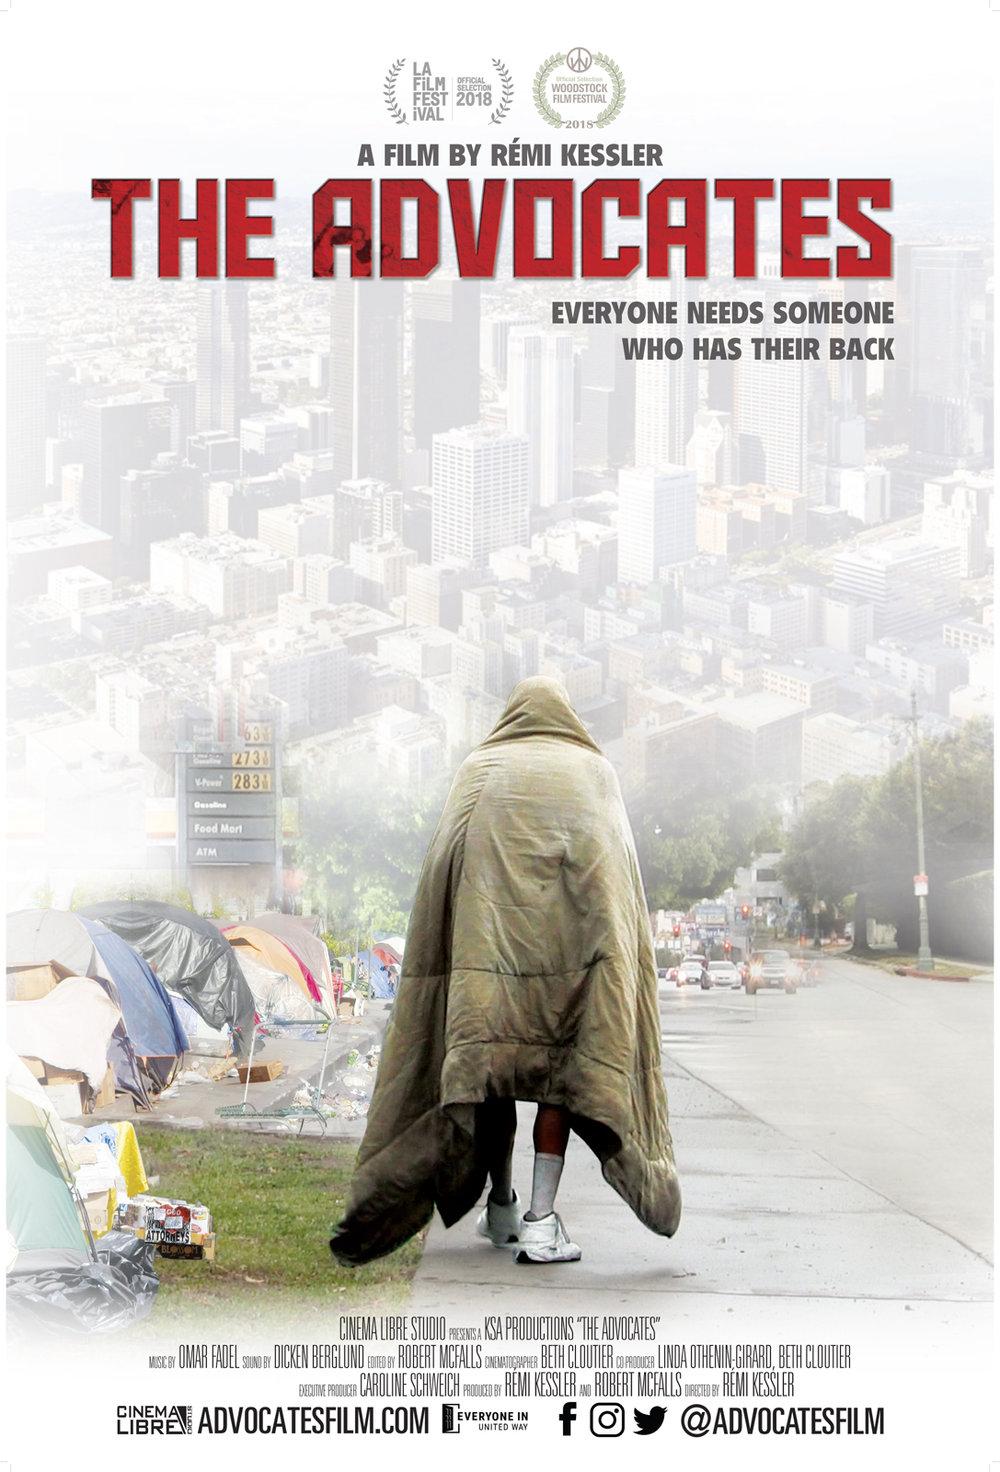 TheAdvocates-Poster-1080x1600.jpg